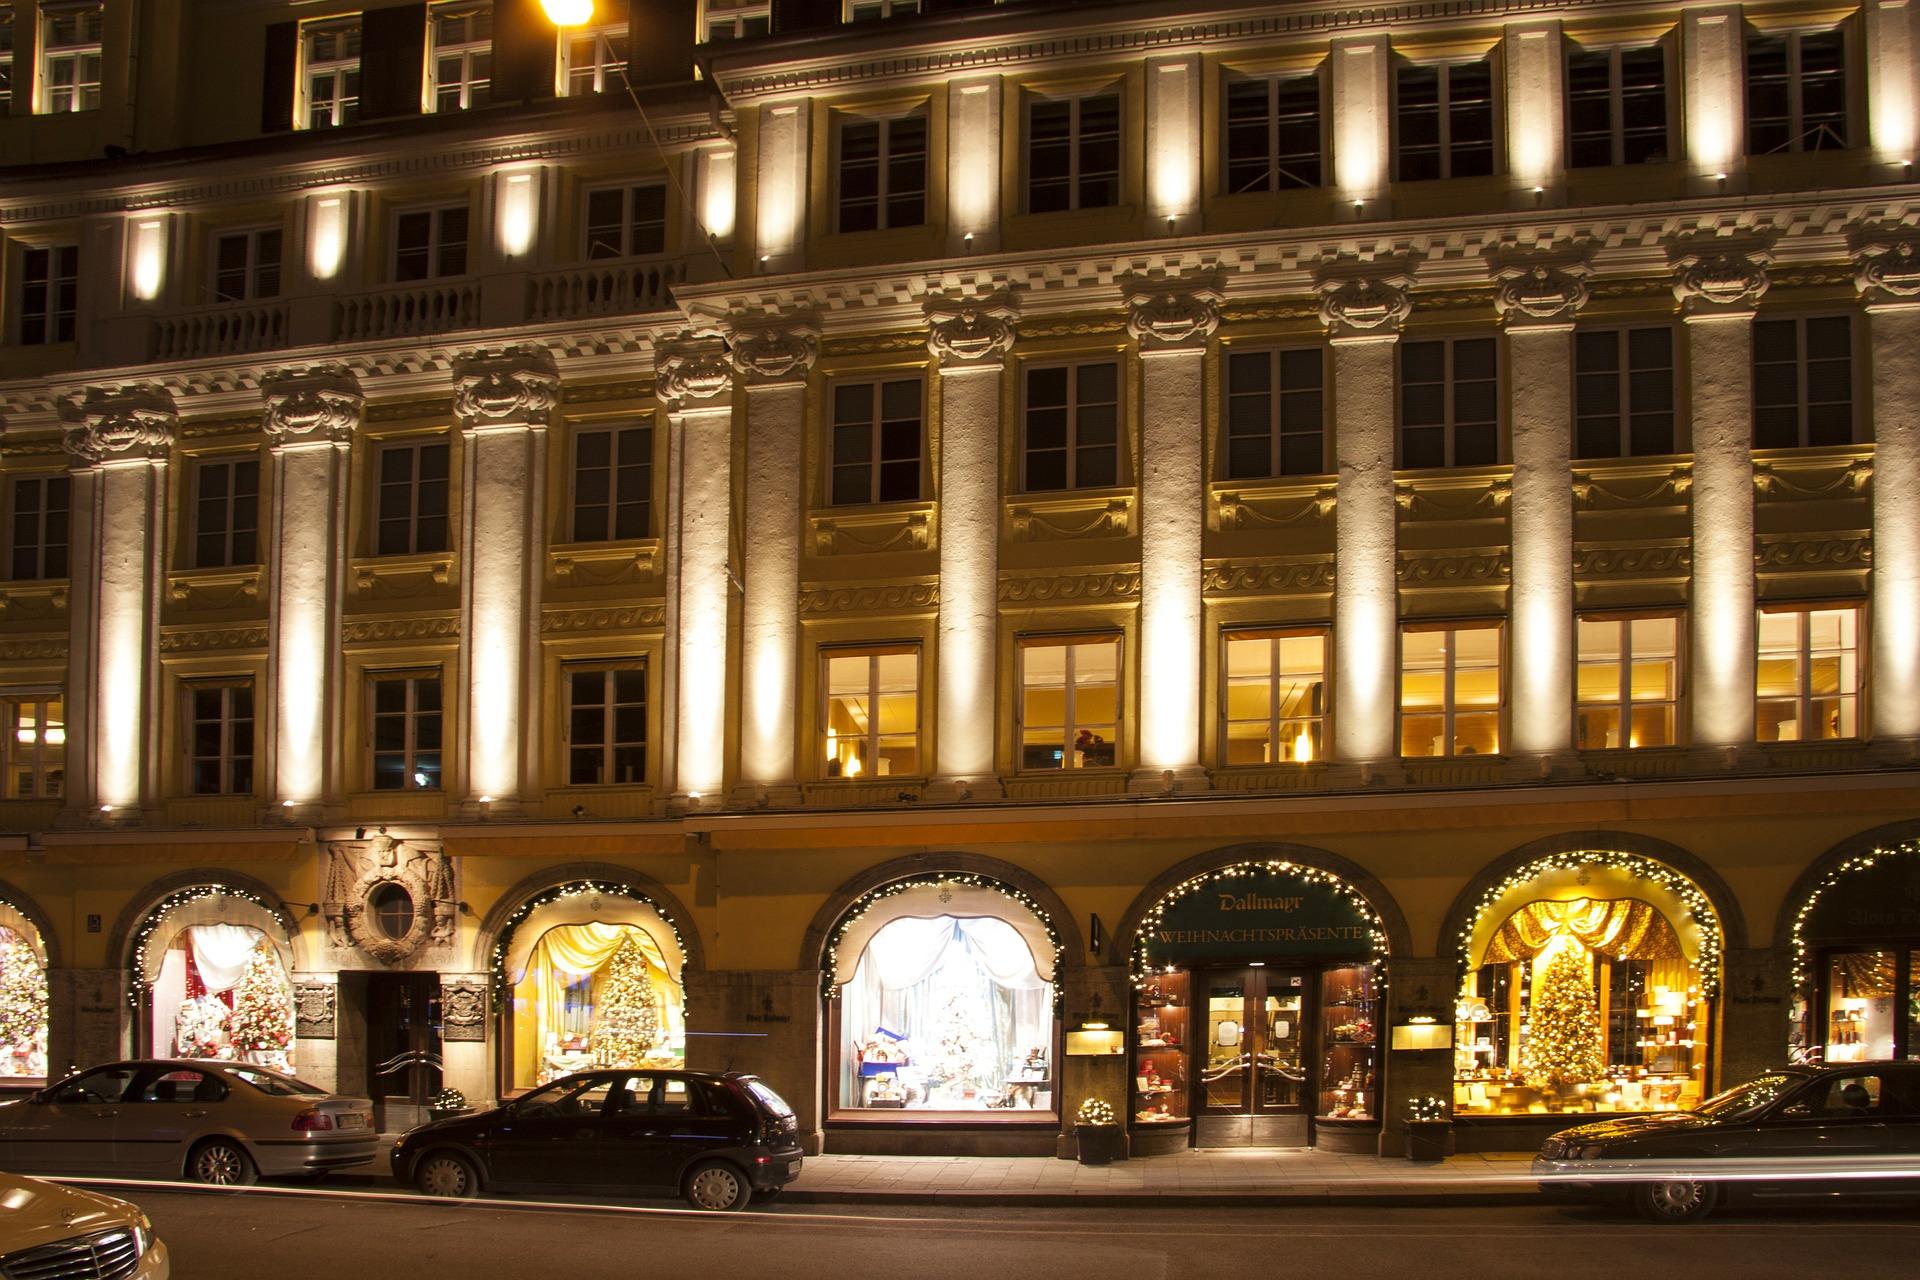 department-store-68858_1920.jpg